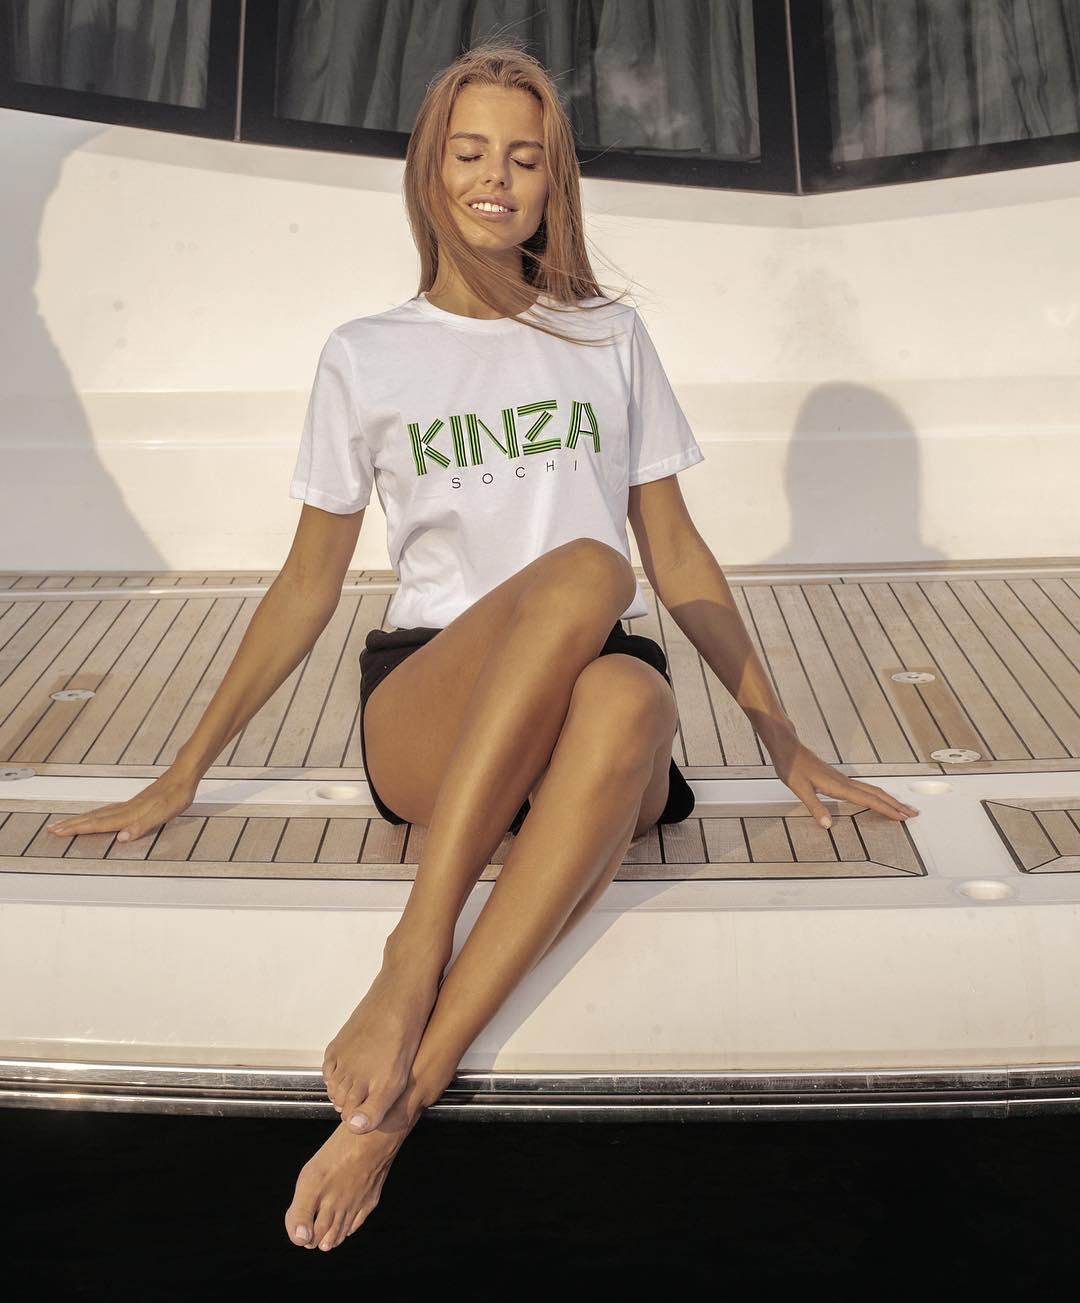 dasha-klyukina-lesbiyanka